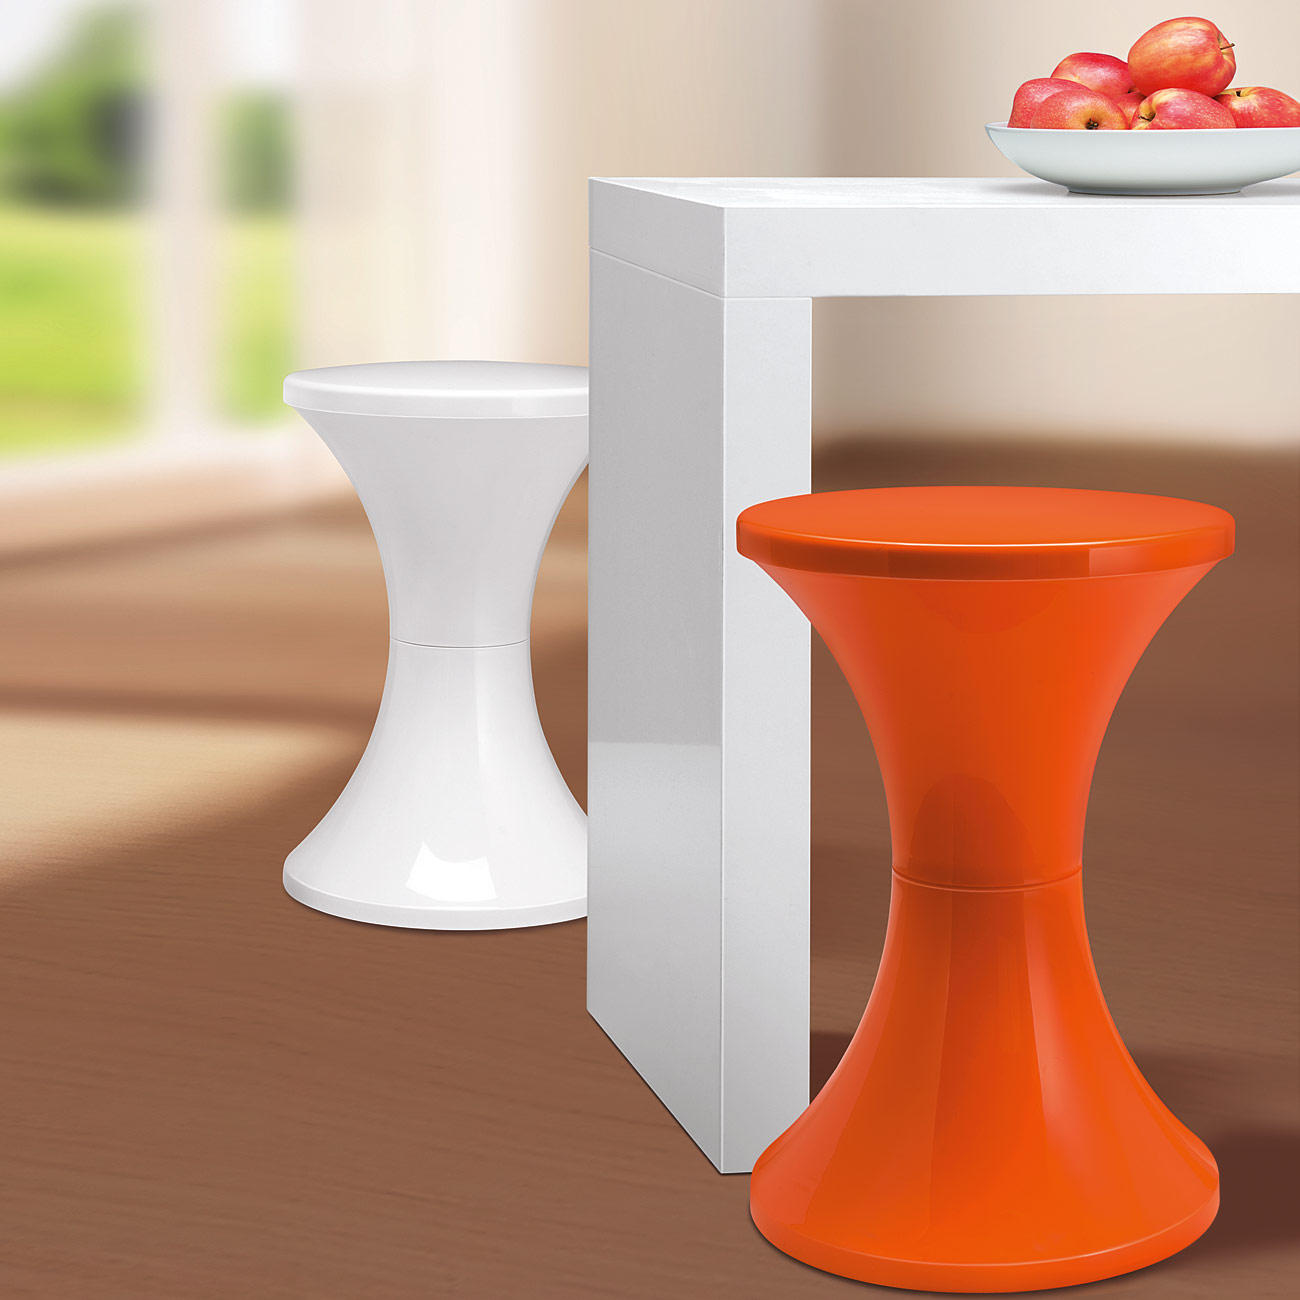 tabouret tam tam garantie produit de 3 ans. Black Bedroom Furniture Sets. Home Design Ideas